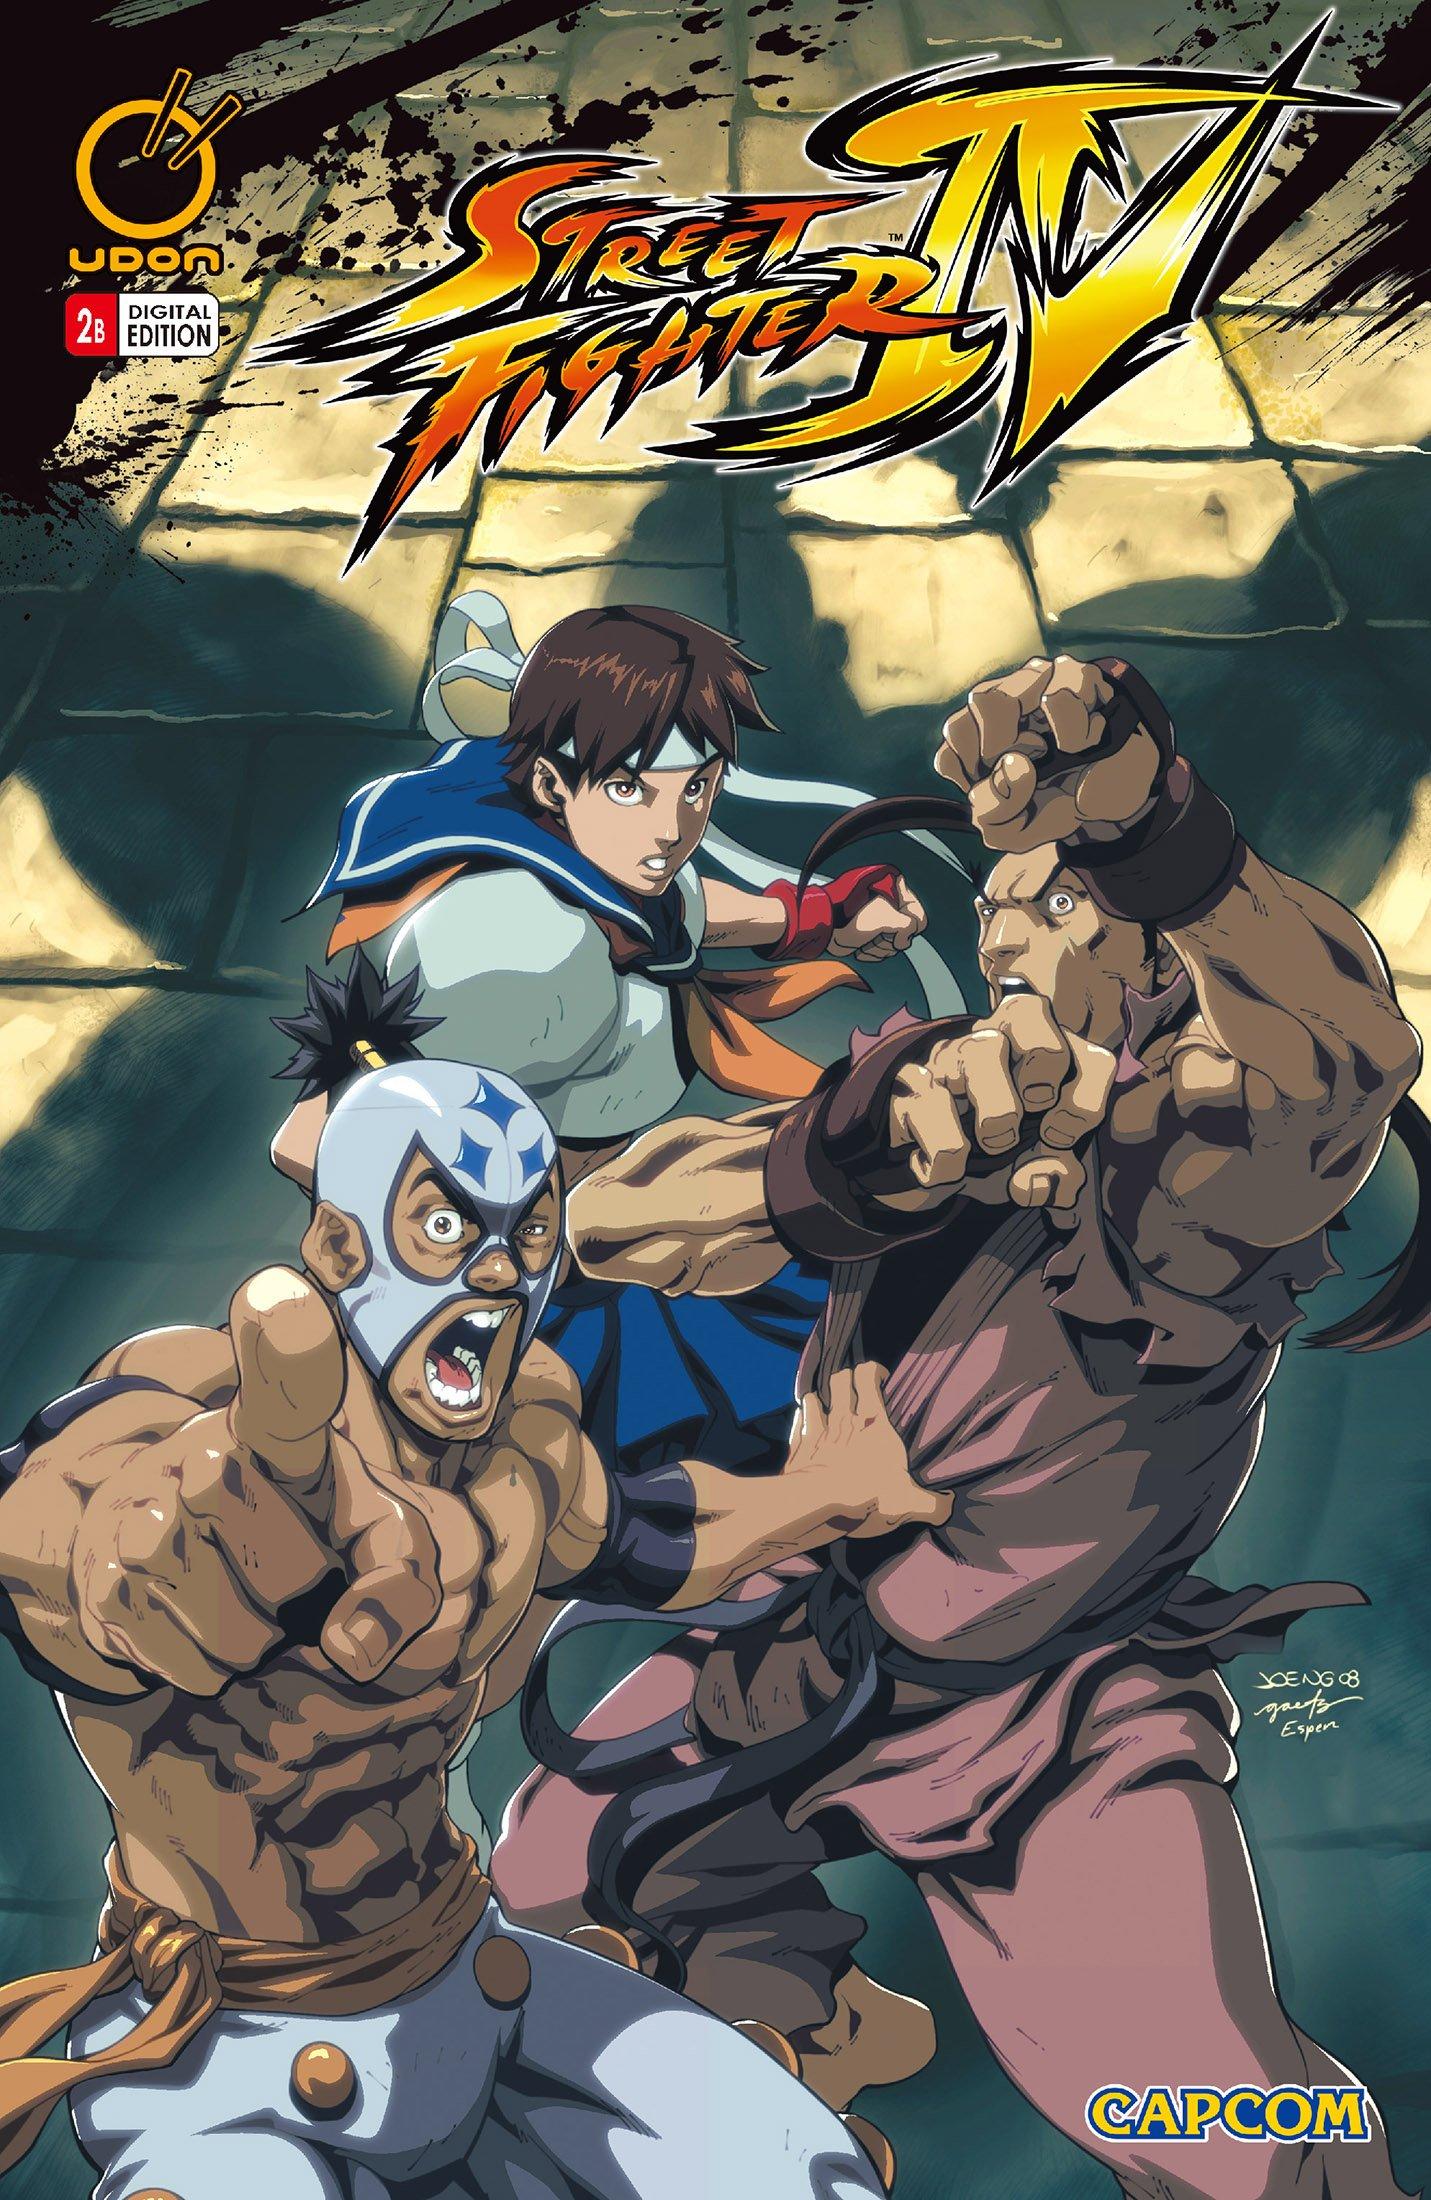 Street Fighter IV 002 (April 2009) (cover b)